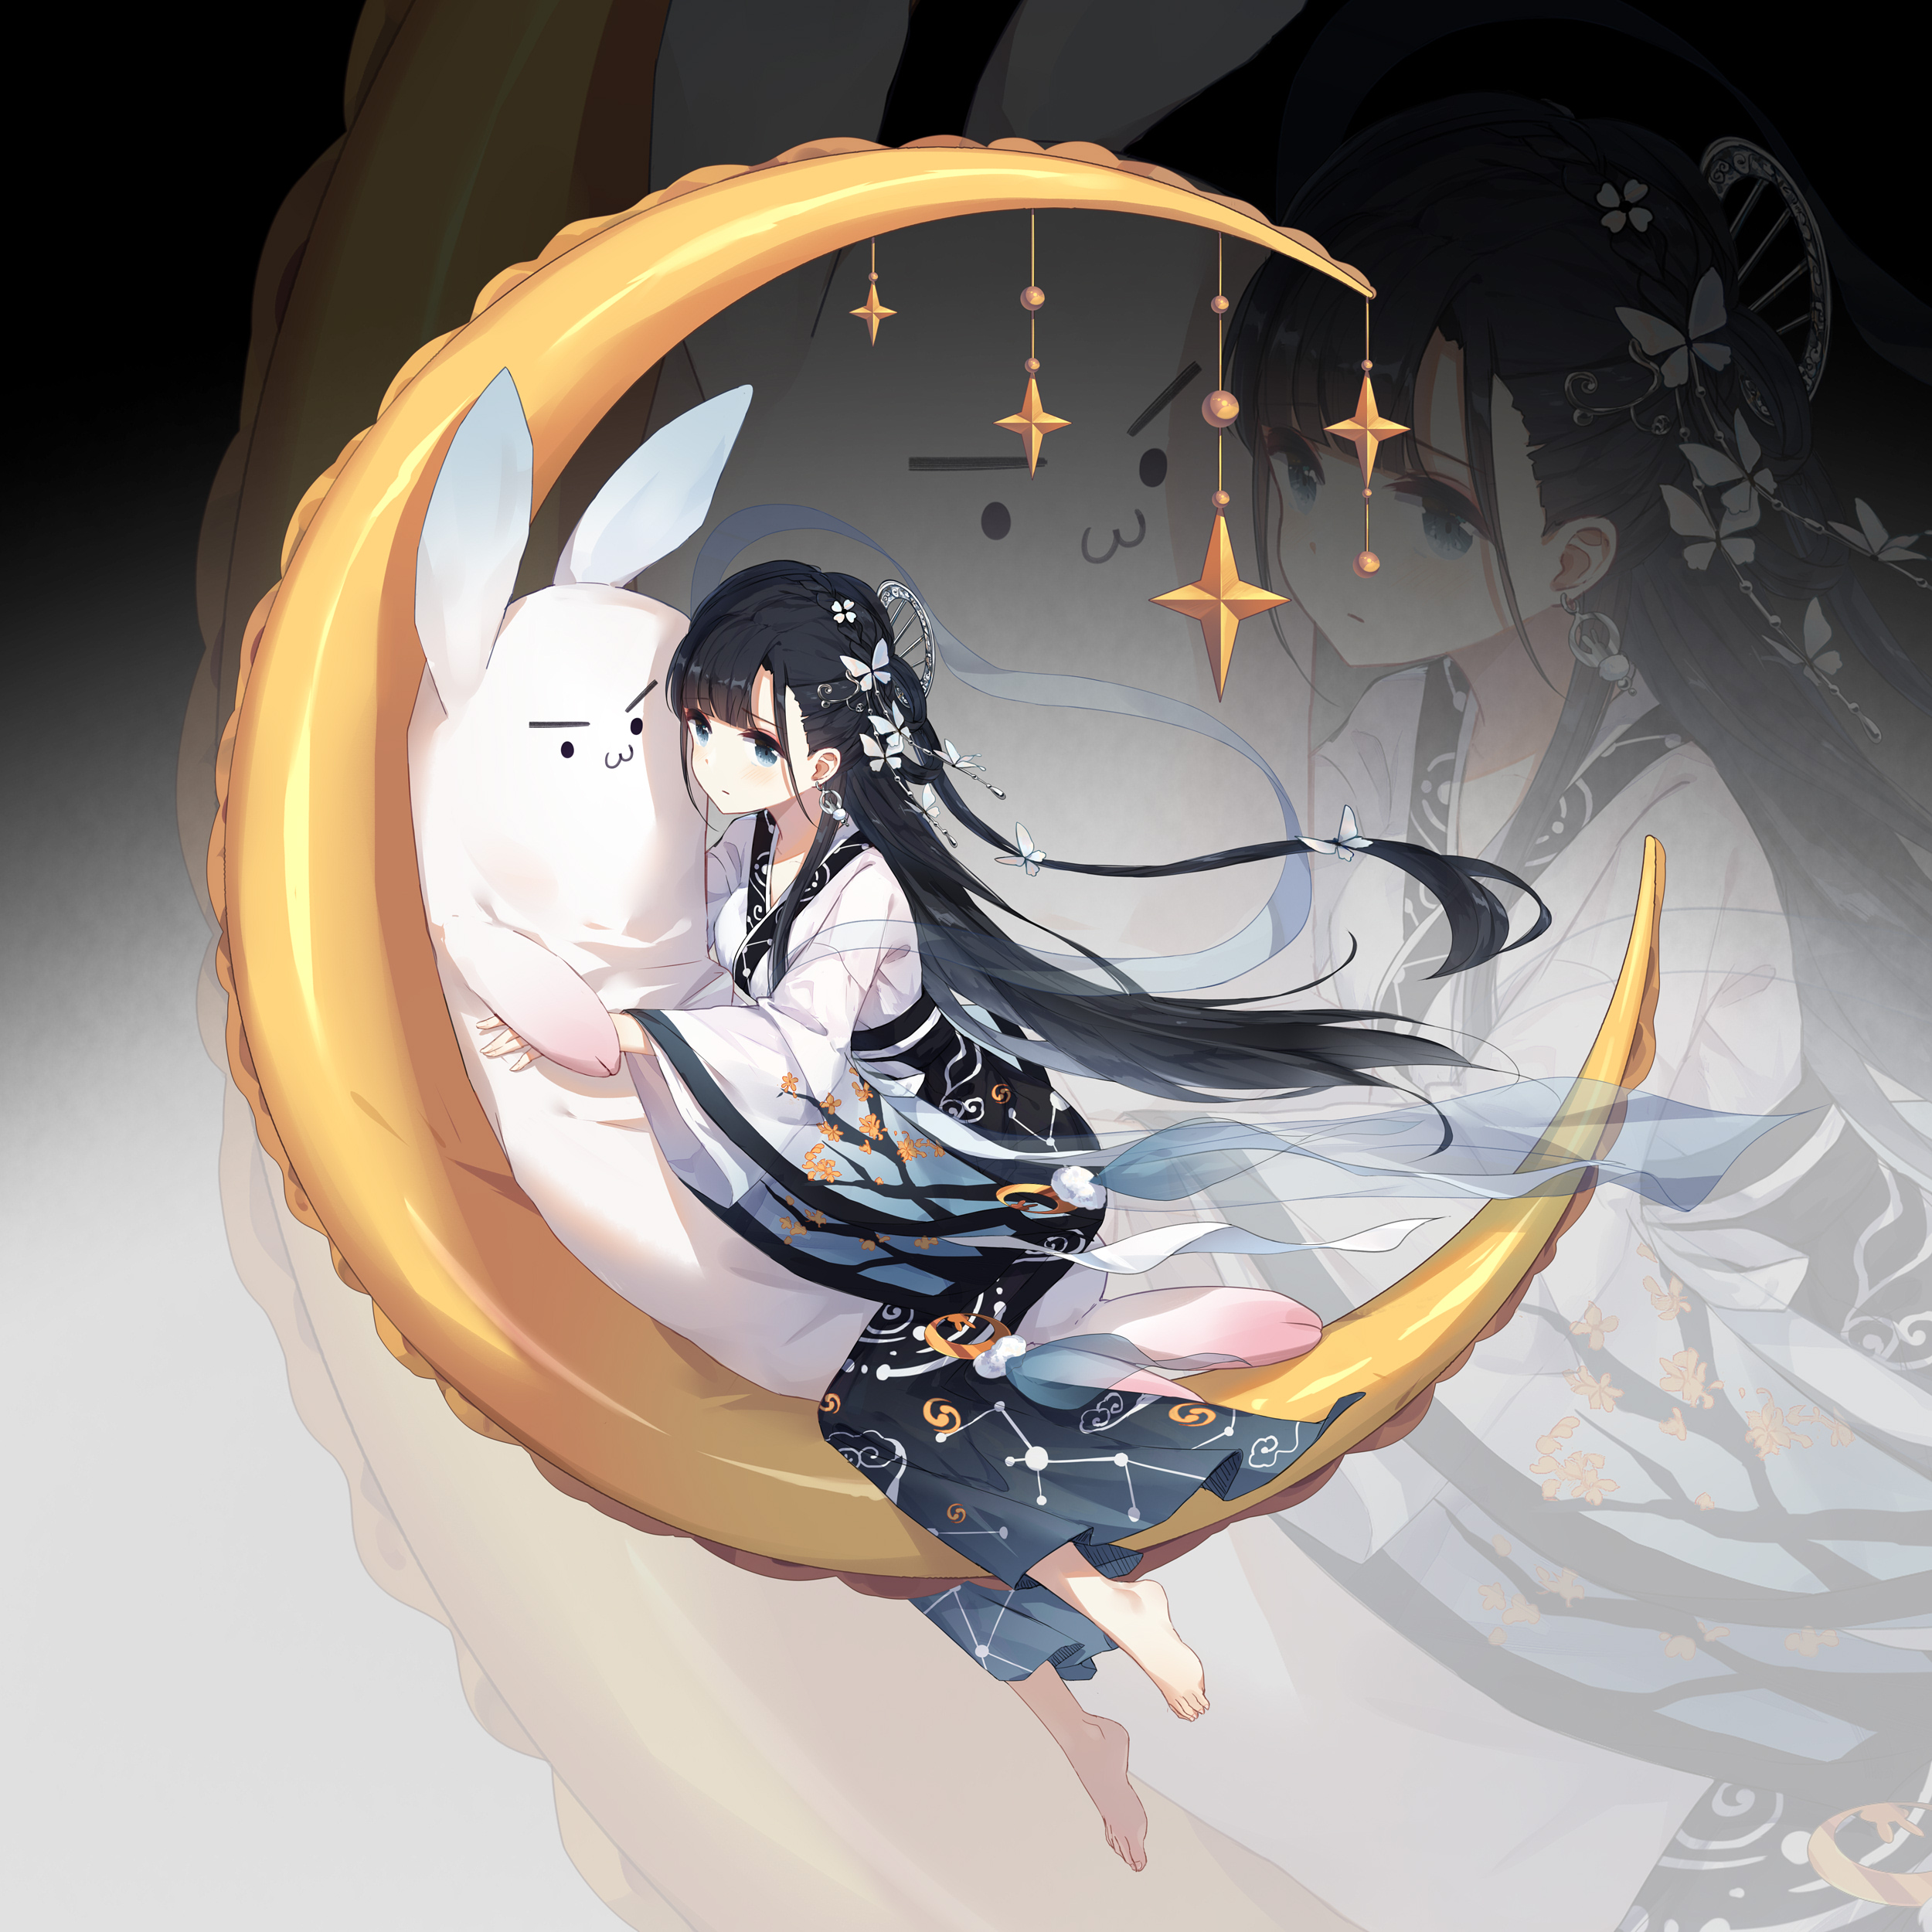 【P站画师】中国画师樾月的插画作品,自称业余的大佬- ACG17.COM